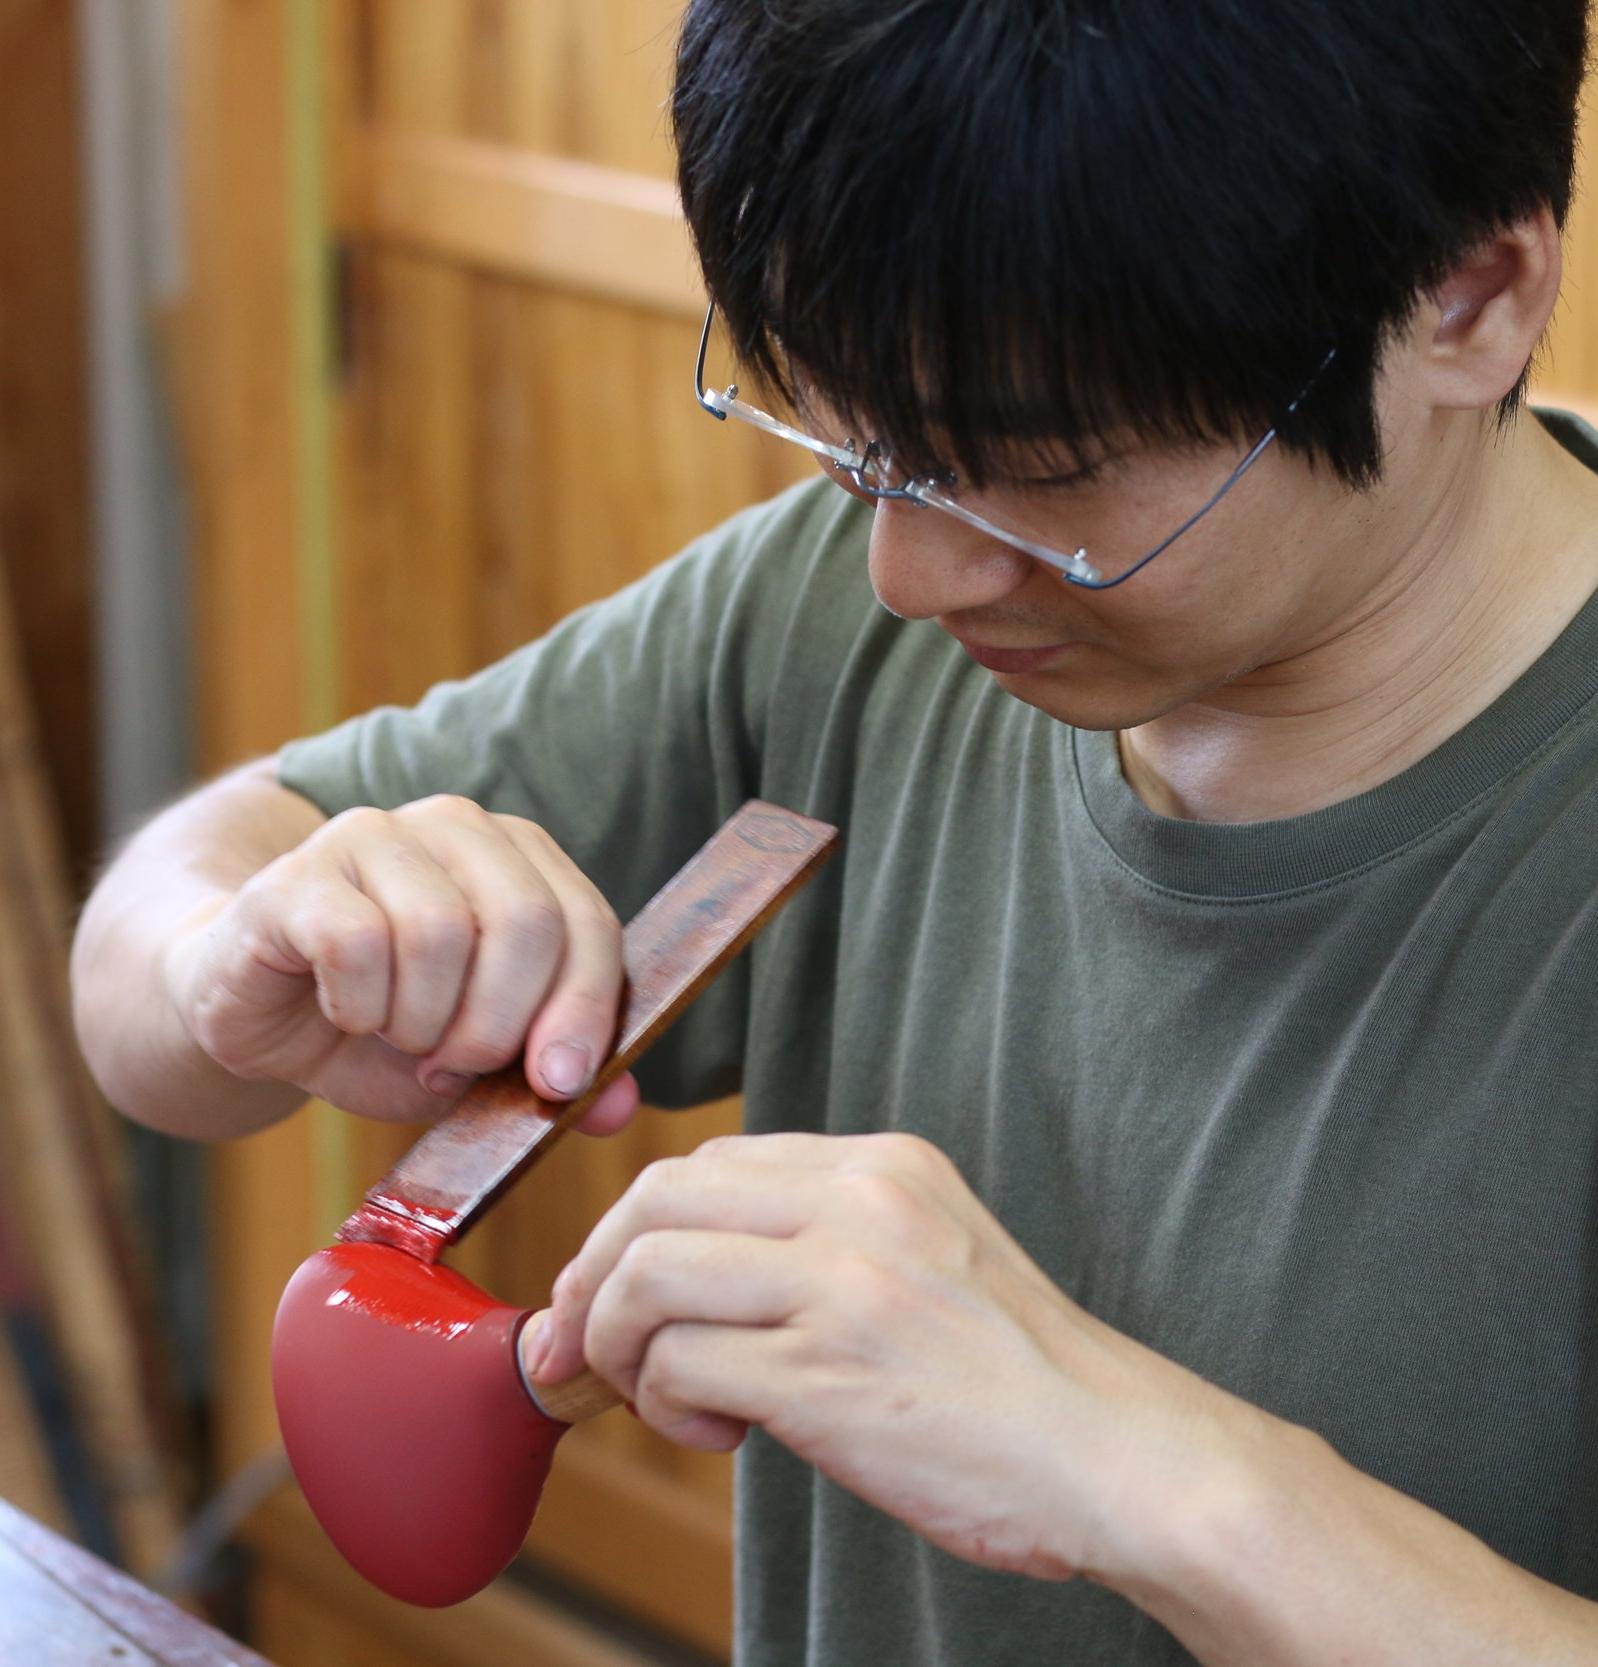 Atelier Takumi _ Craftsman Urushi Japan _ Mitsuhiro Kyoden 1.JPG